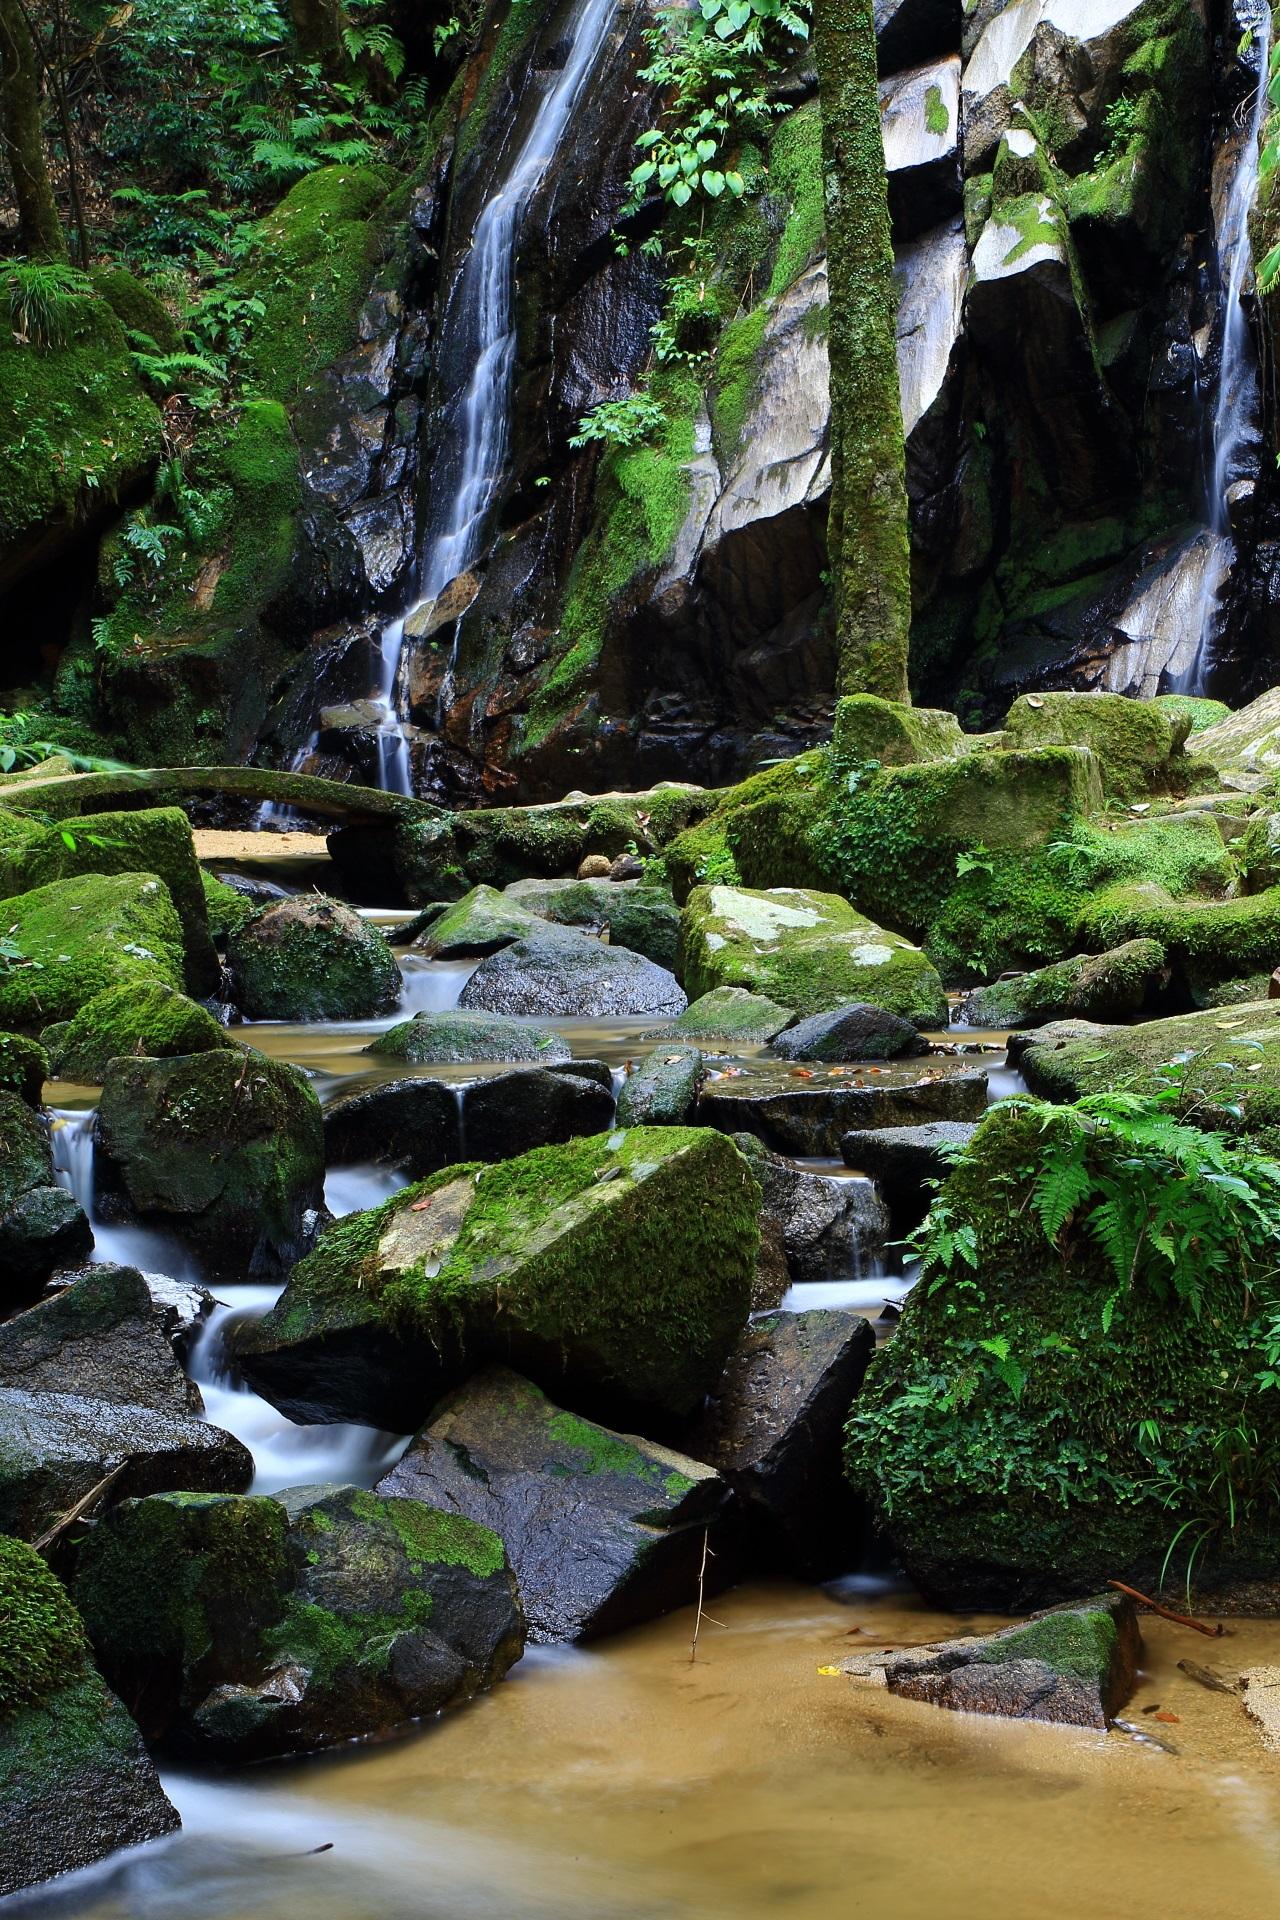 Beautiful Kanabiki-no-taki Waterfall in Kyoto